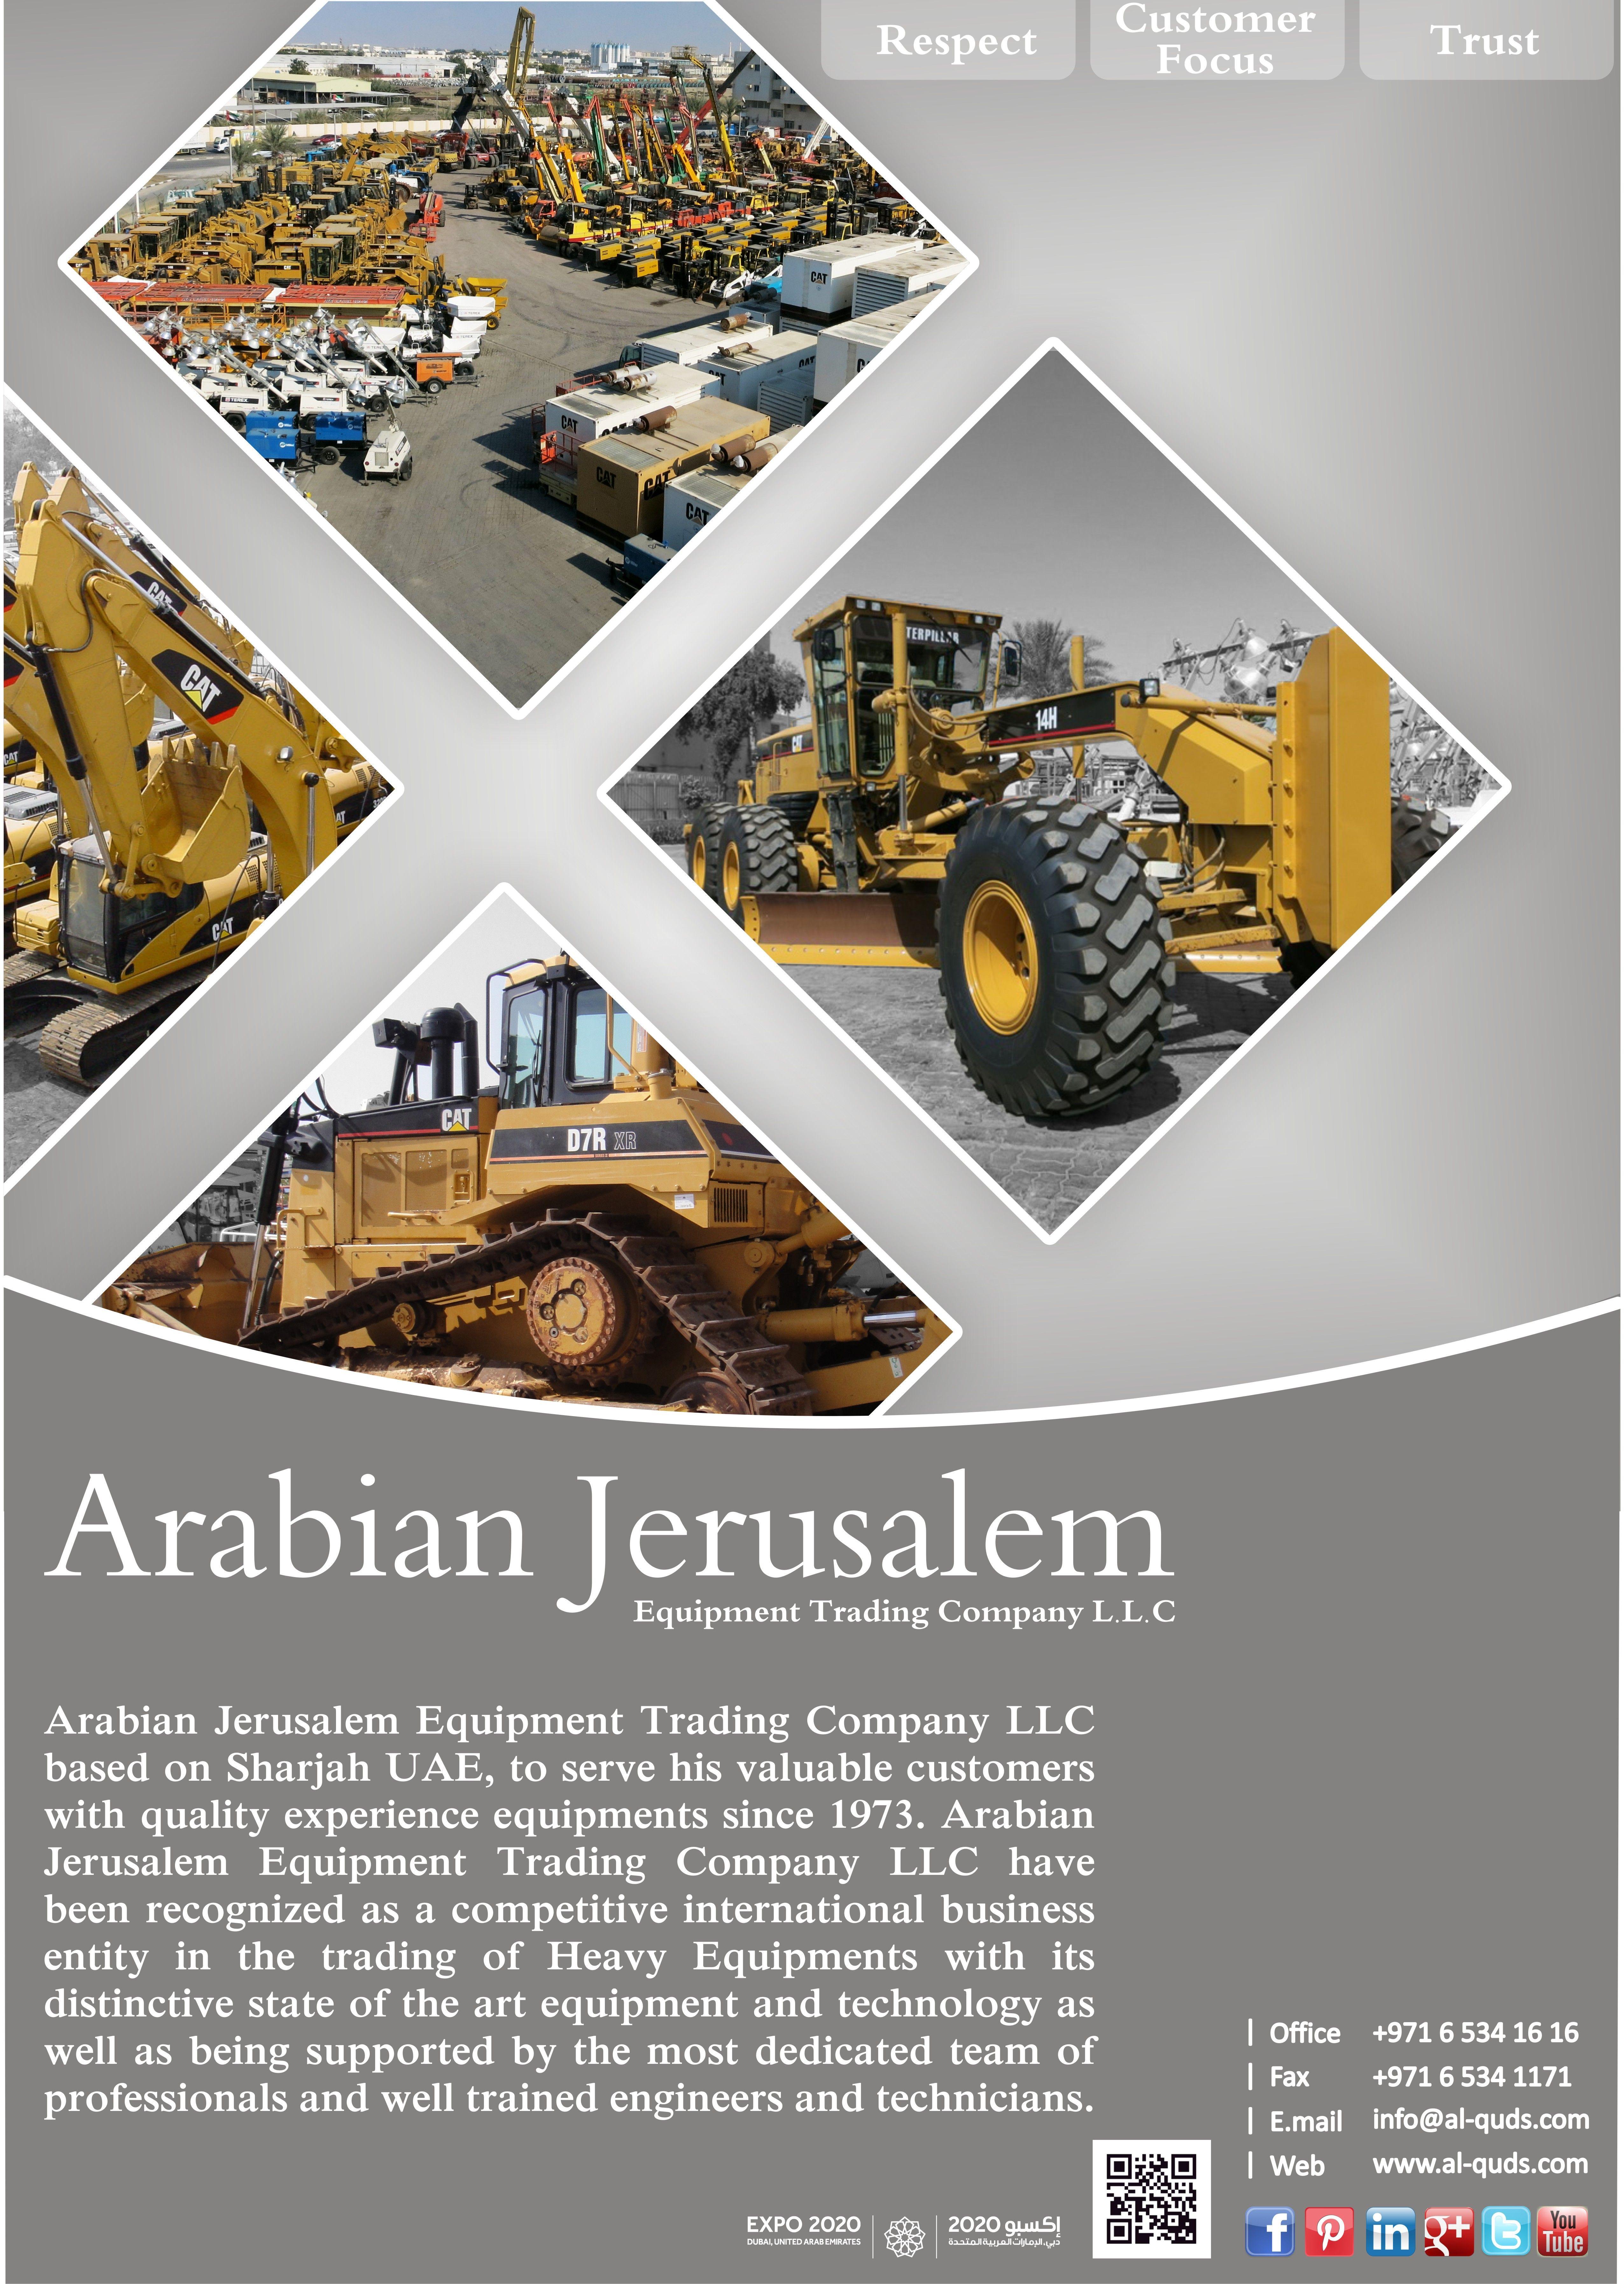 Arabian Jerusalem Equipment Trading Company L L C A